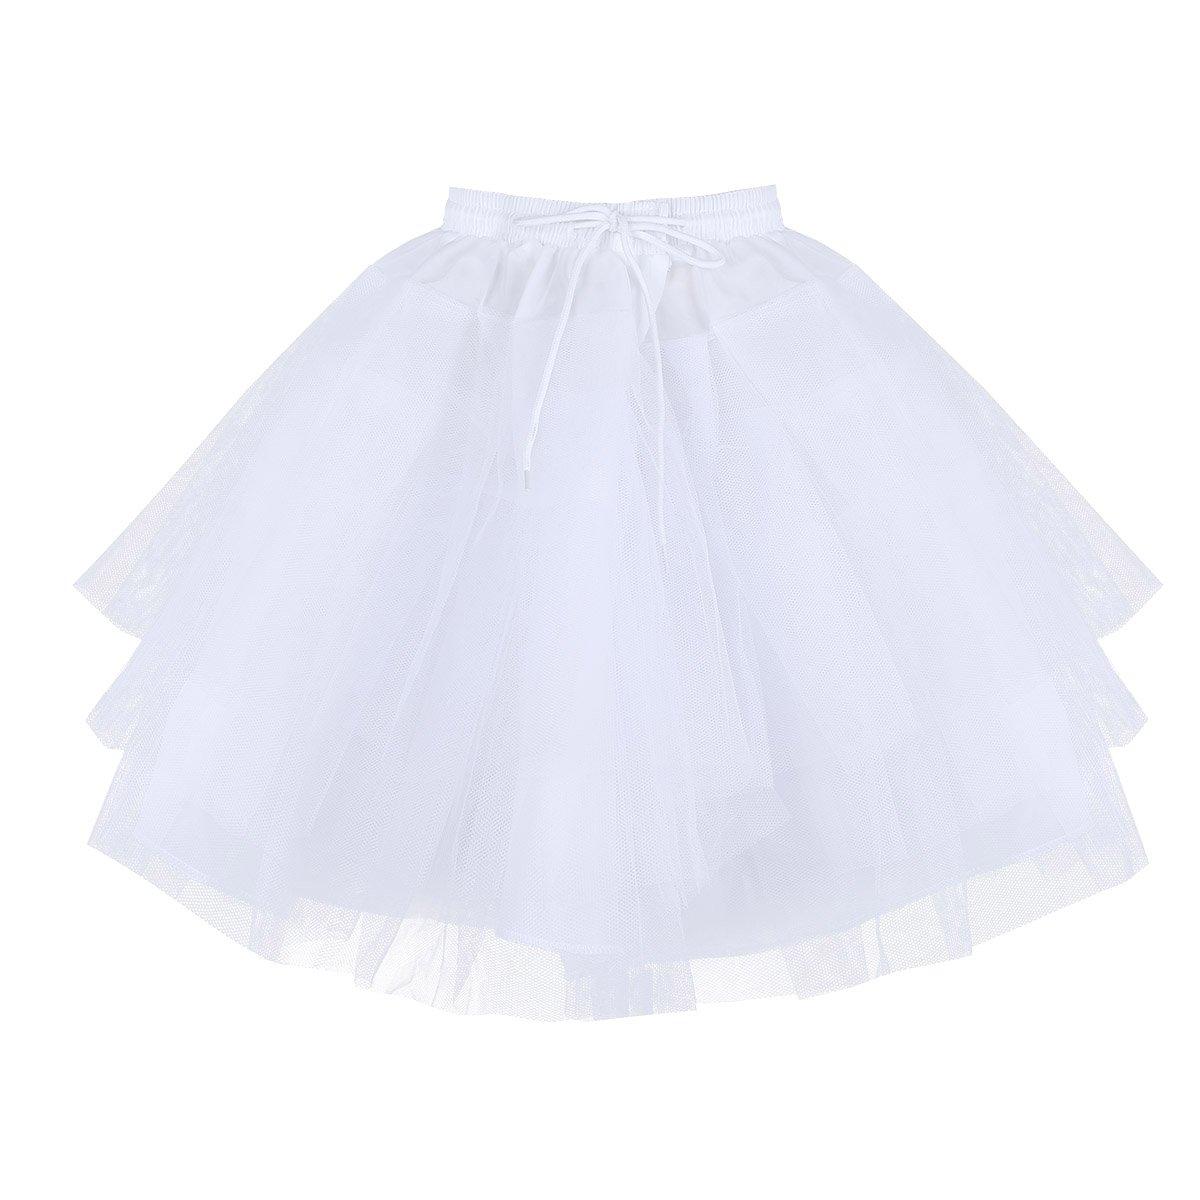 CHICTRY Kids Wedding Ball Gown Lace Edge 3 Layers Net Flower Girl's Crinoline Petticoat Skirt Slips